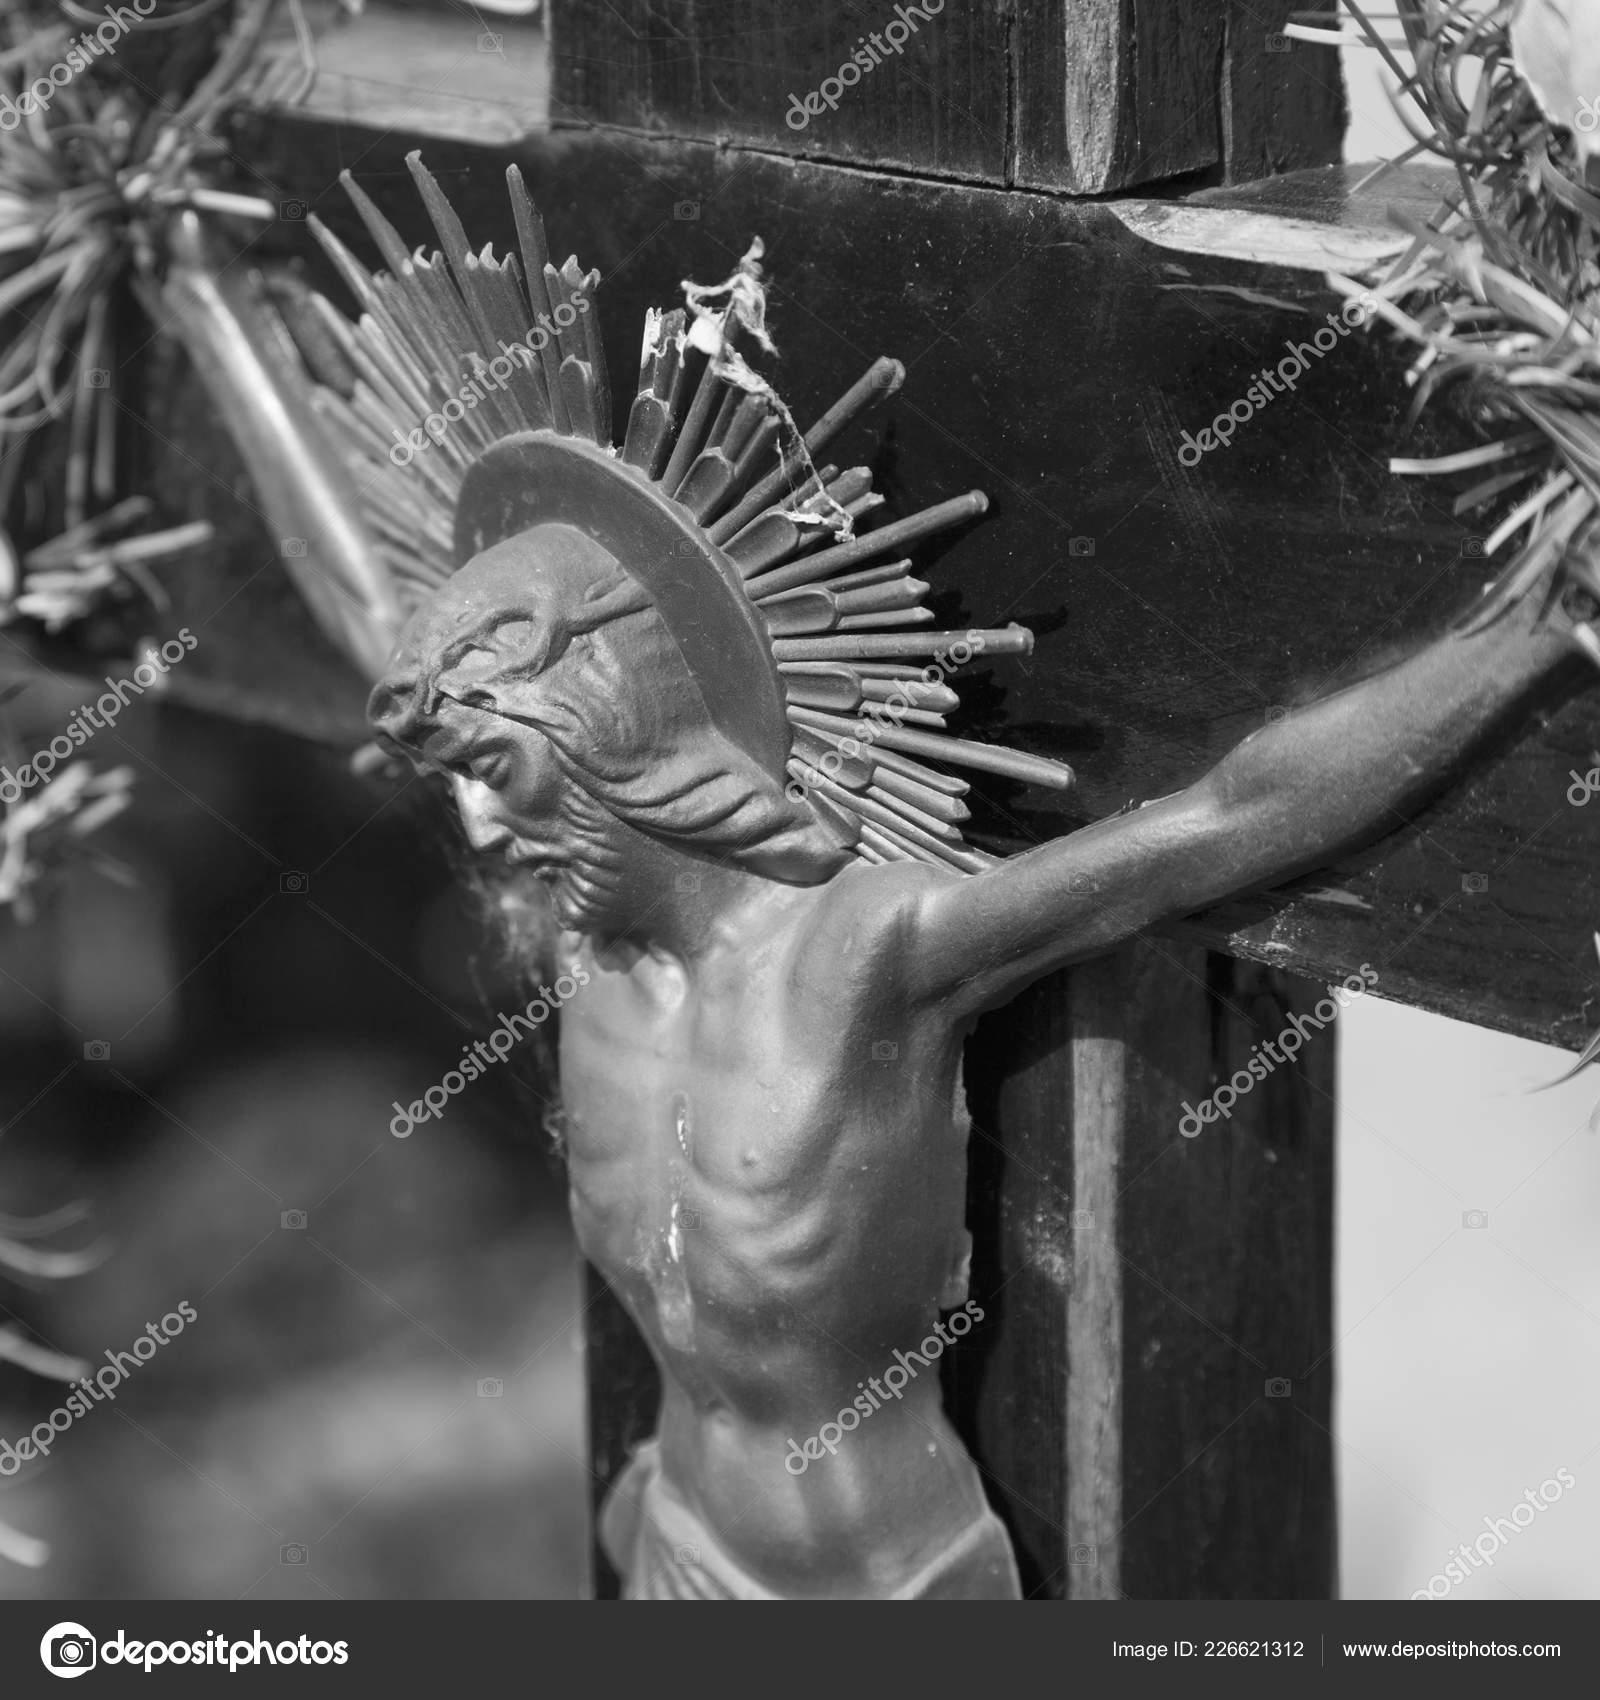 Crucifixion Jesus Christ Symbol Resurrection Immortality Human Soul